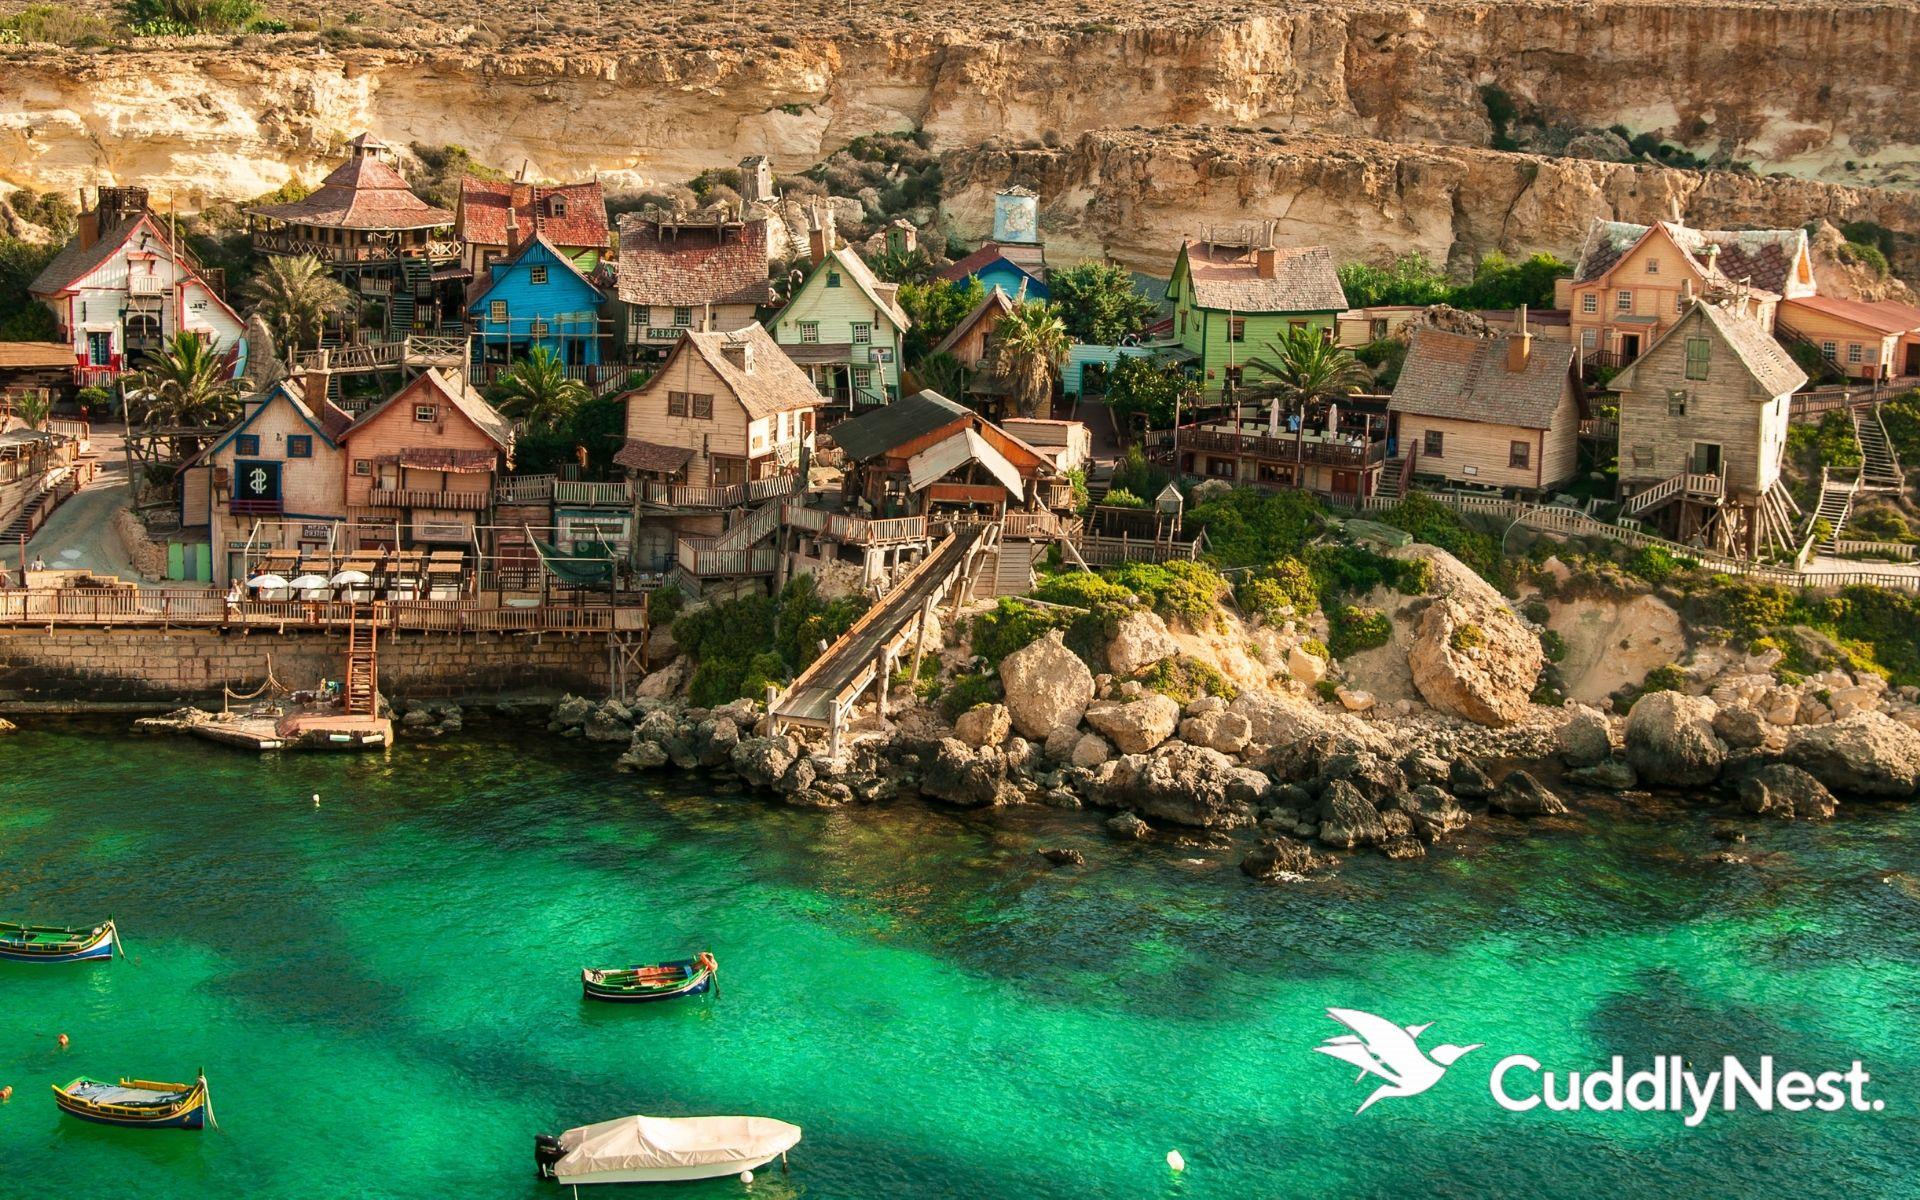 Smallest Countries Destinations Monaco Liechtenstein Malta Andorra Where to Go What to Visit for free and when